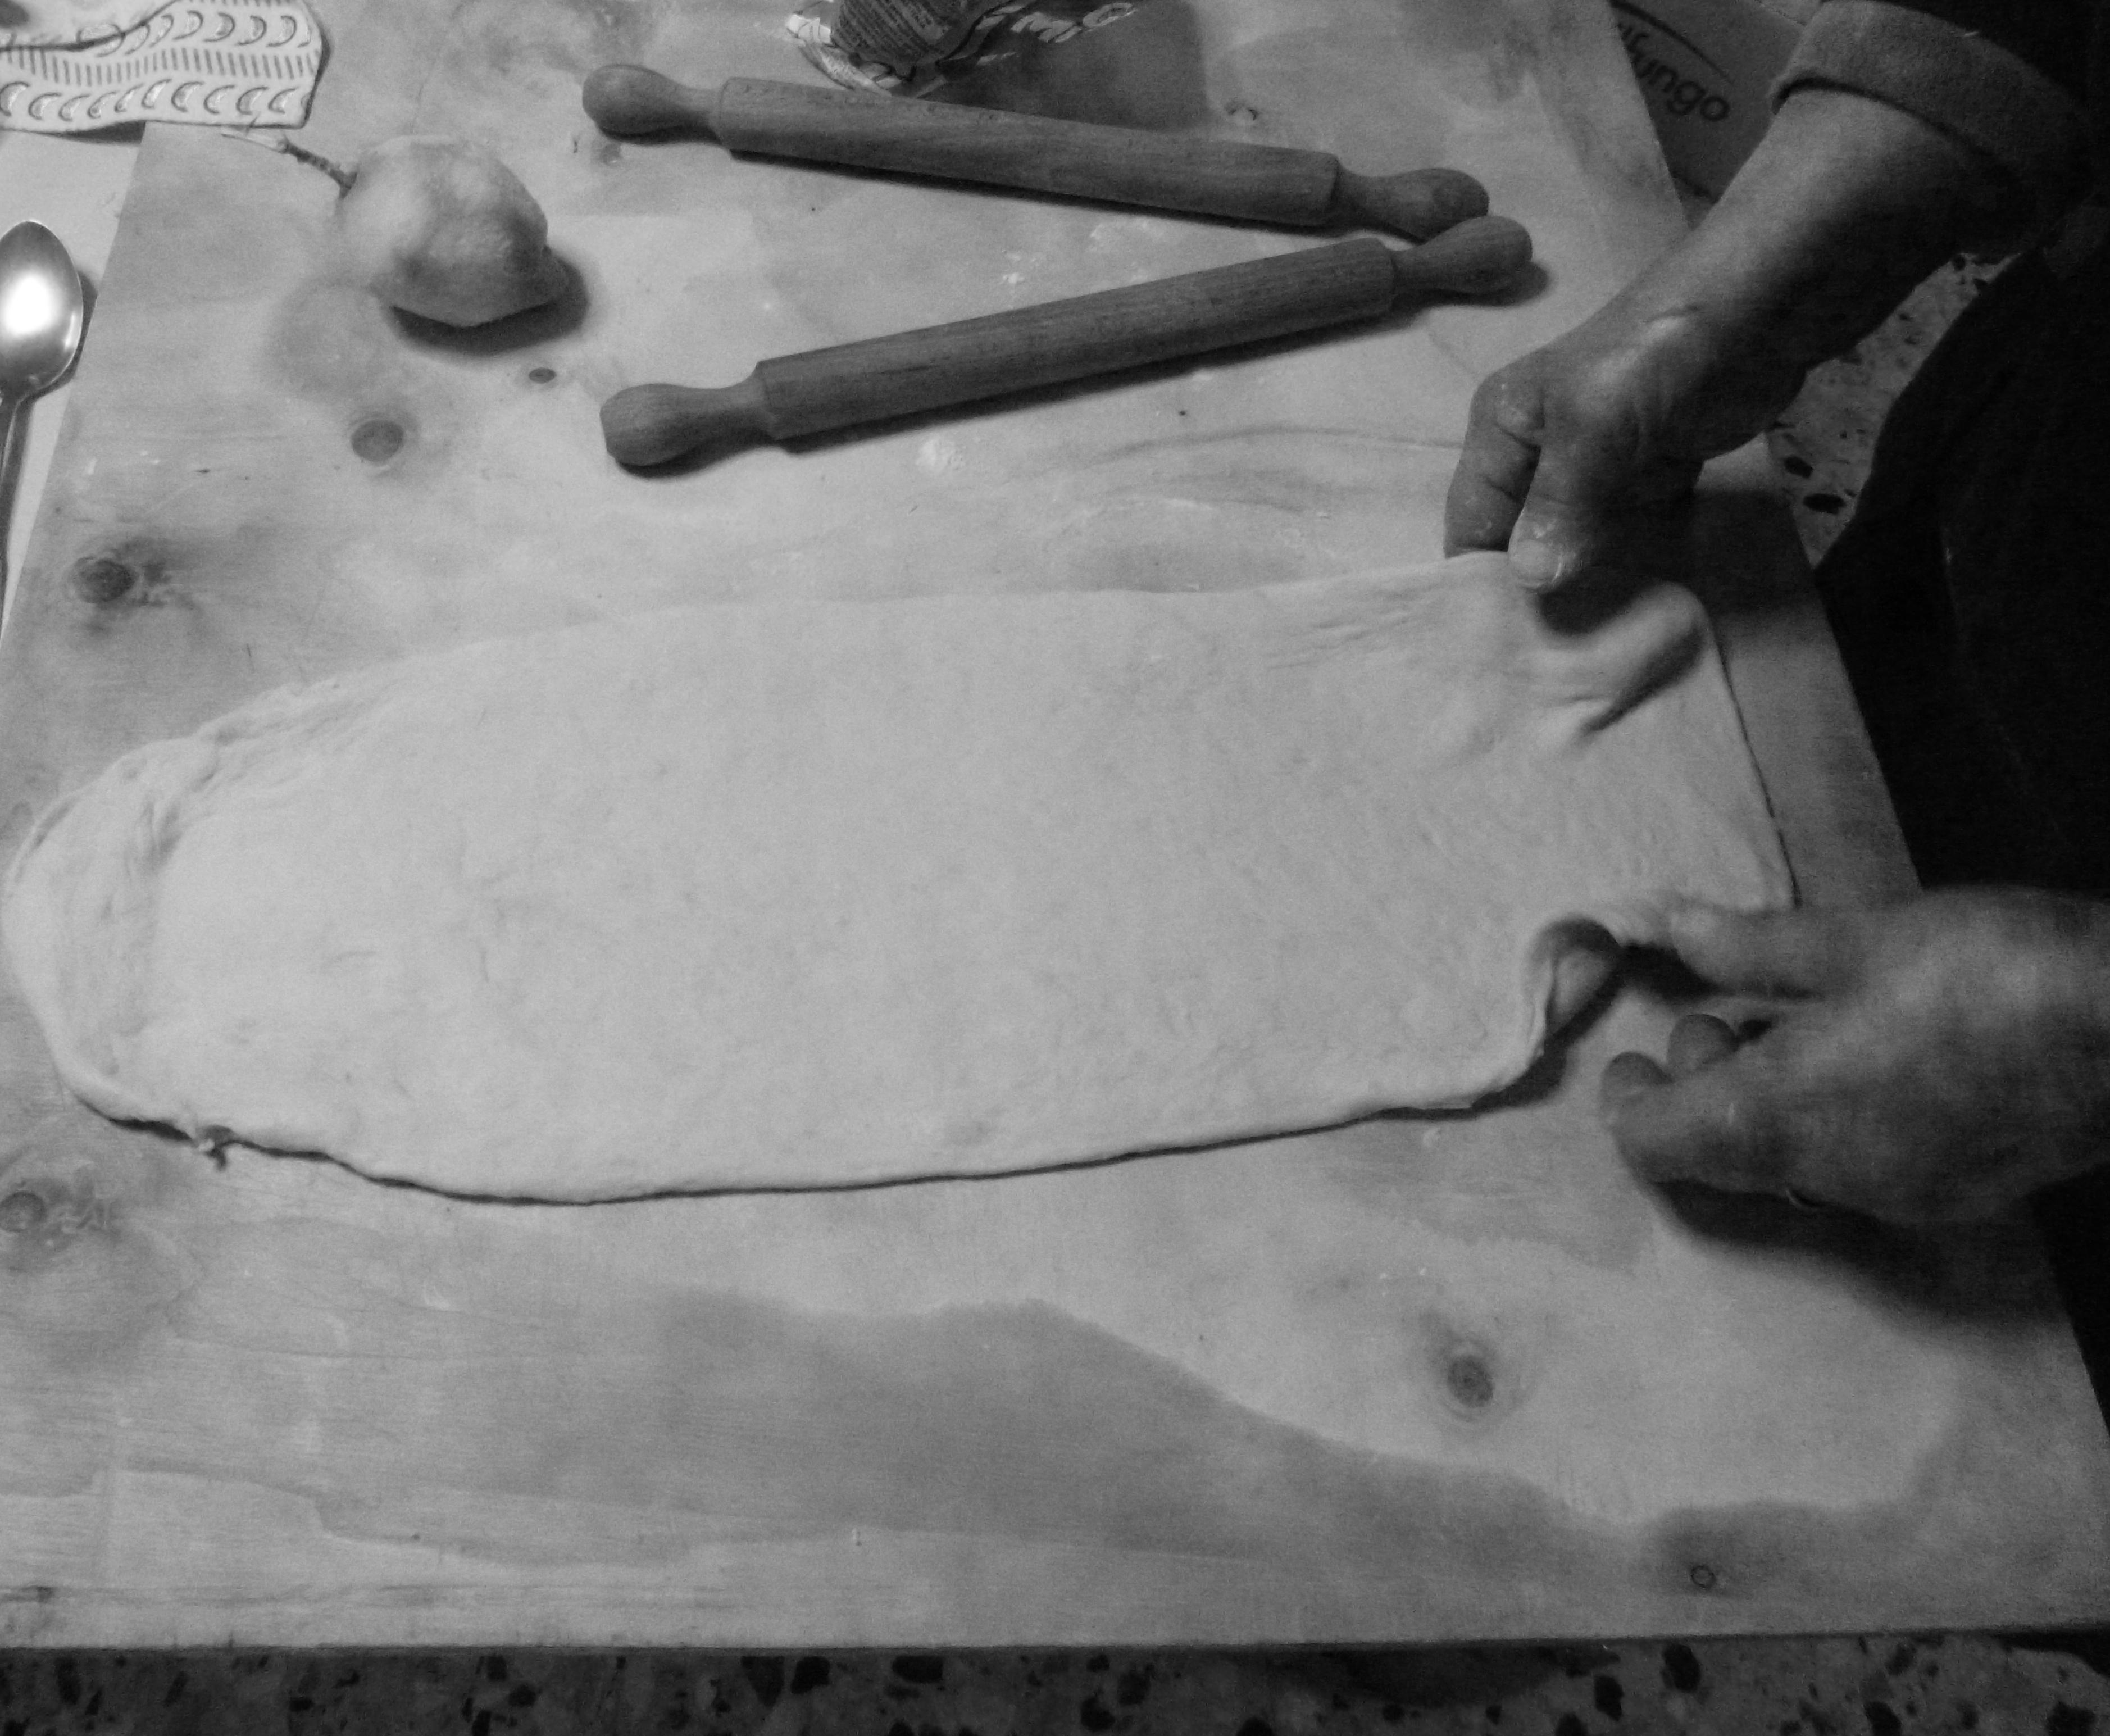 tina making macerata limoncini